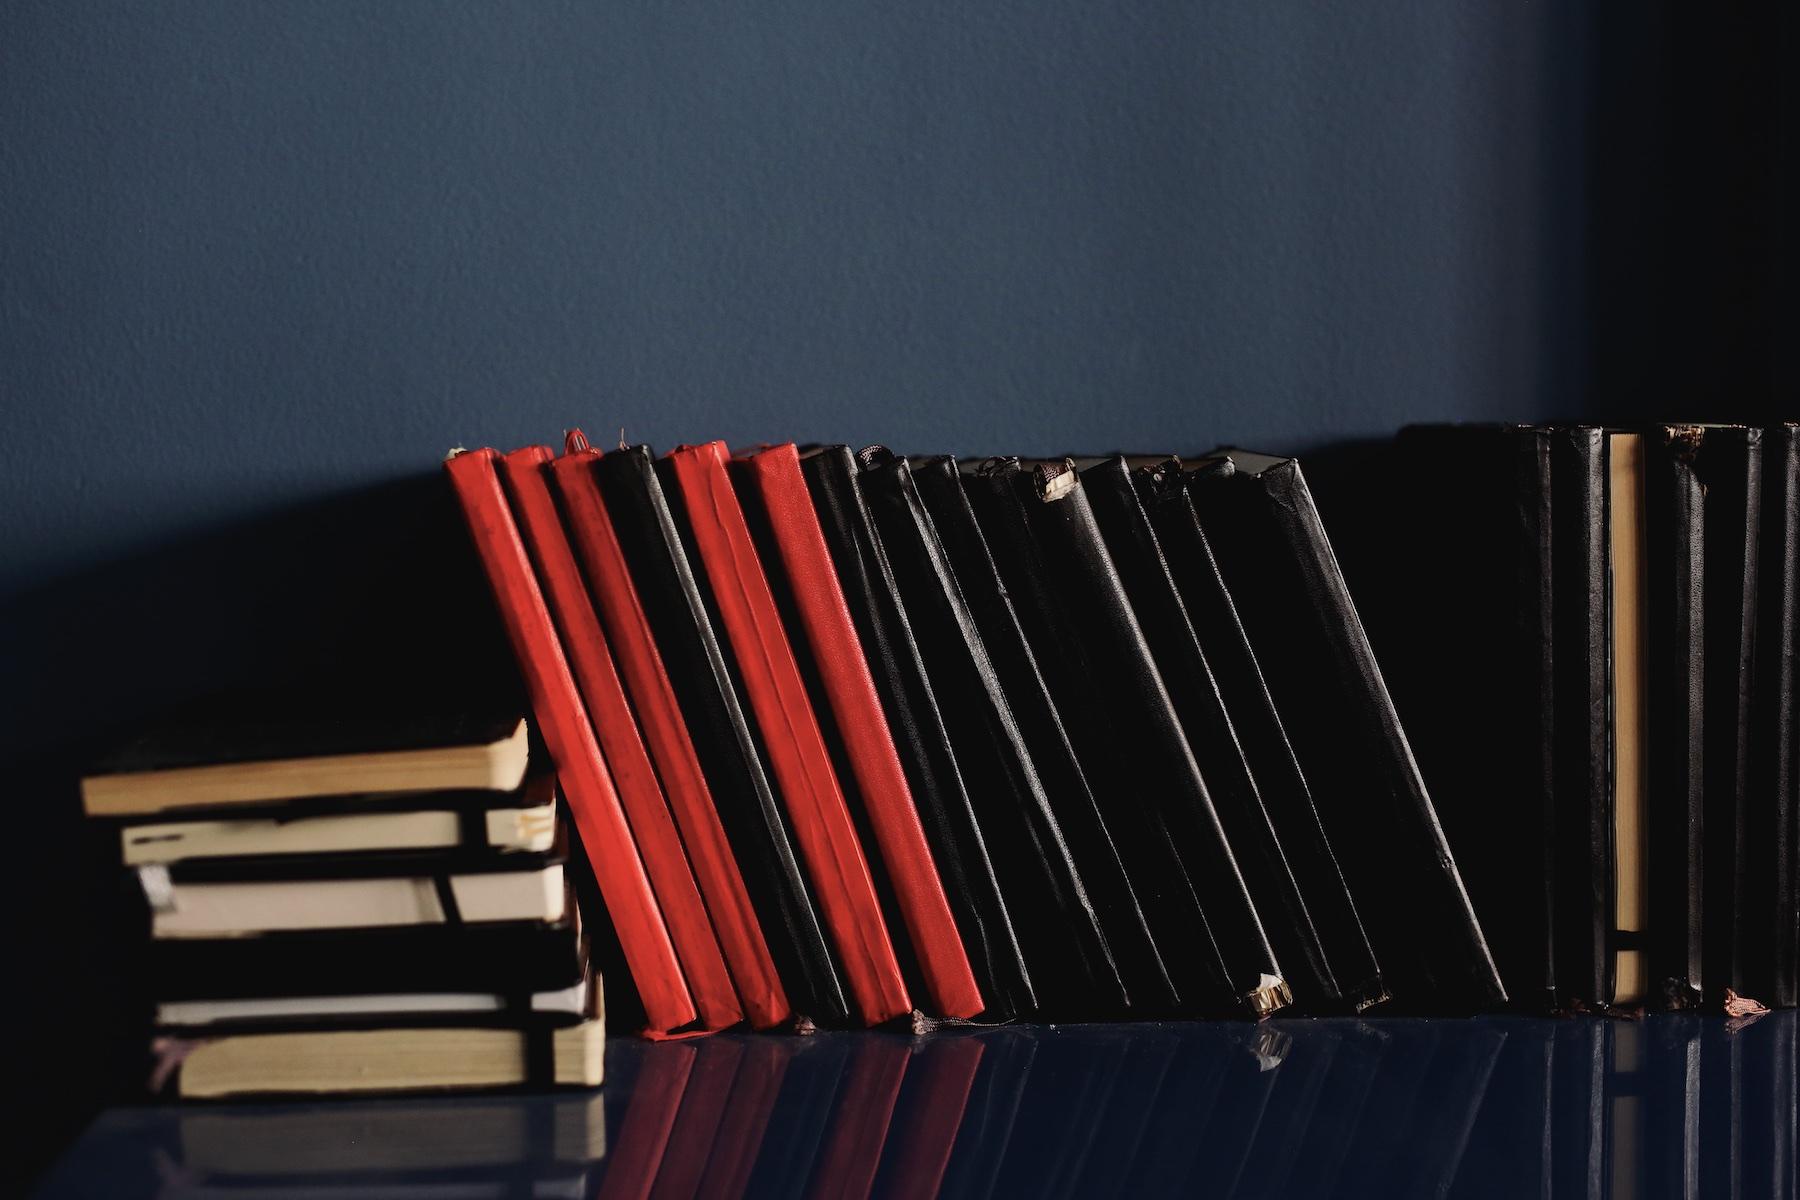 bruno de caumont manoah biesheuvel 14 pulp collectors. Black Bedroom Furniture Sets. Home Design Ideas